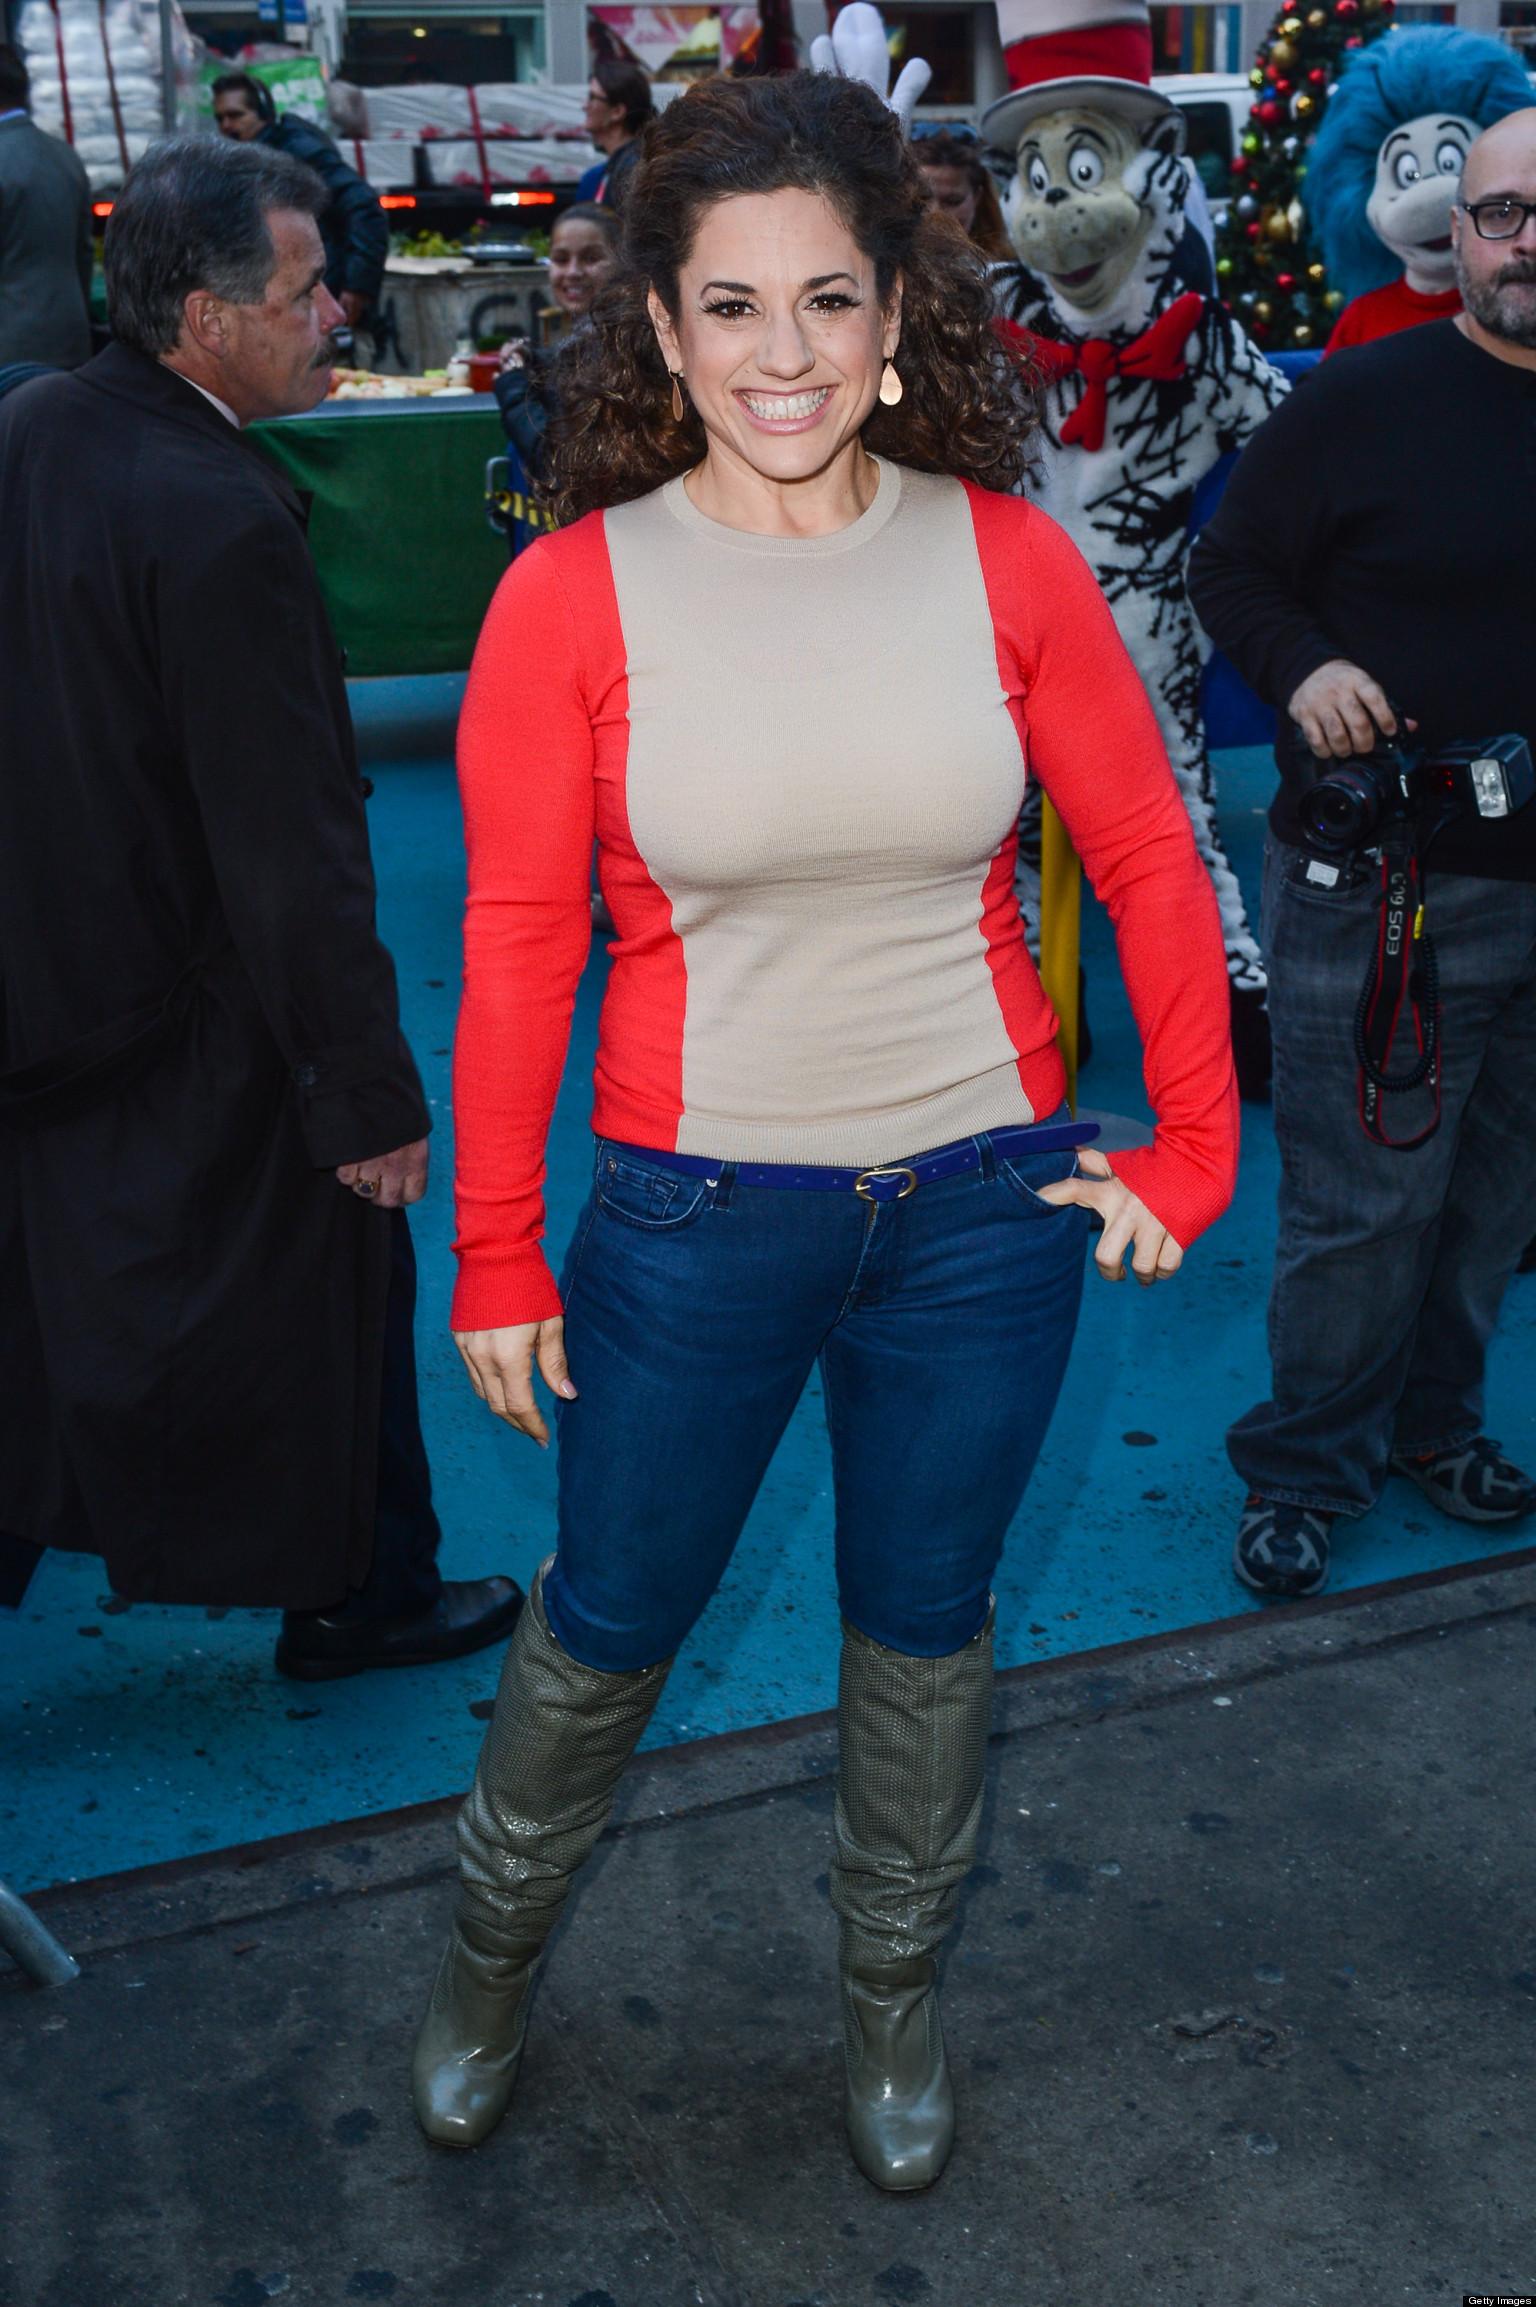 Marissa Jaret Winokur Weight Loss: Actress Shows Off 60 ...